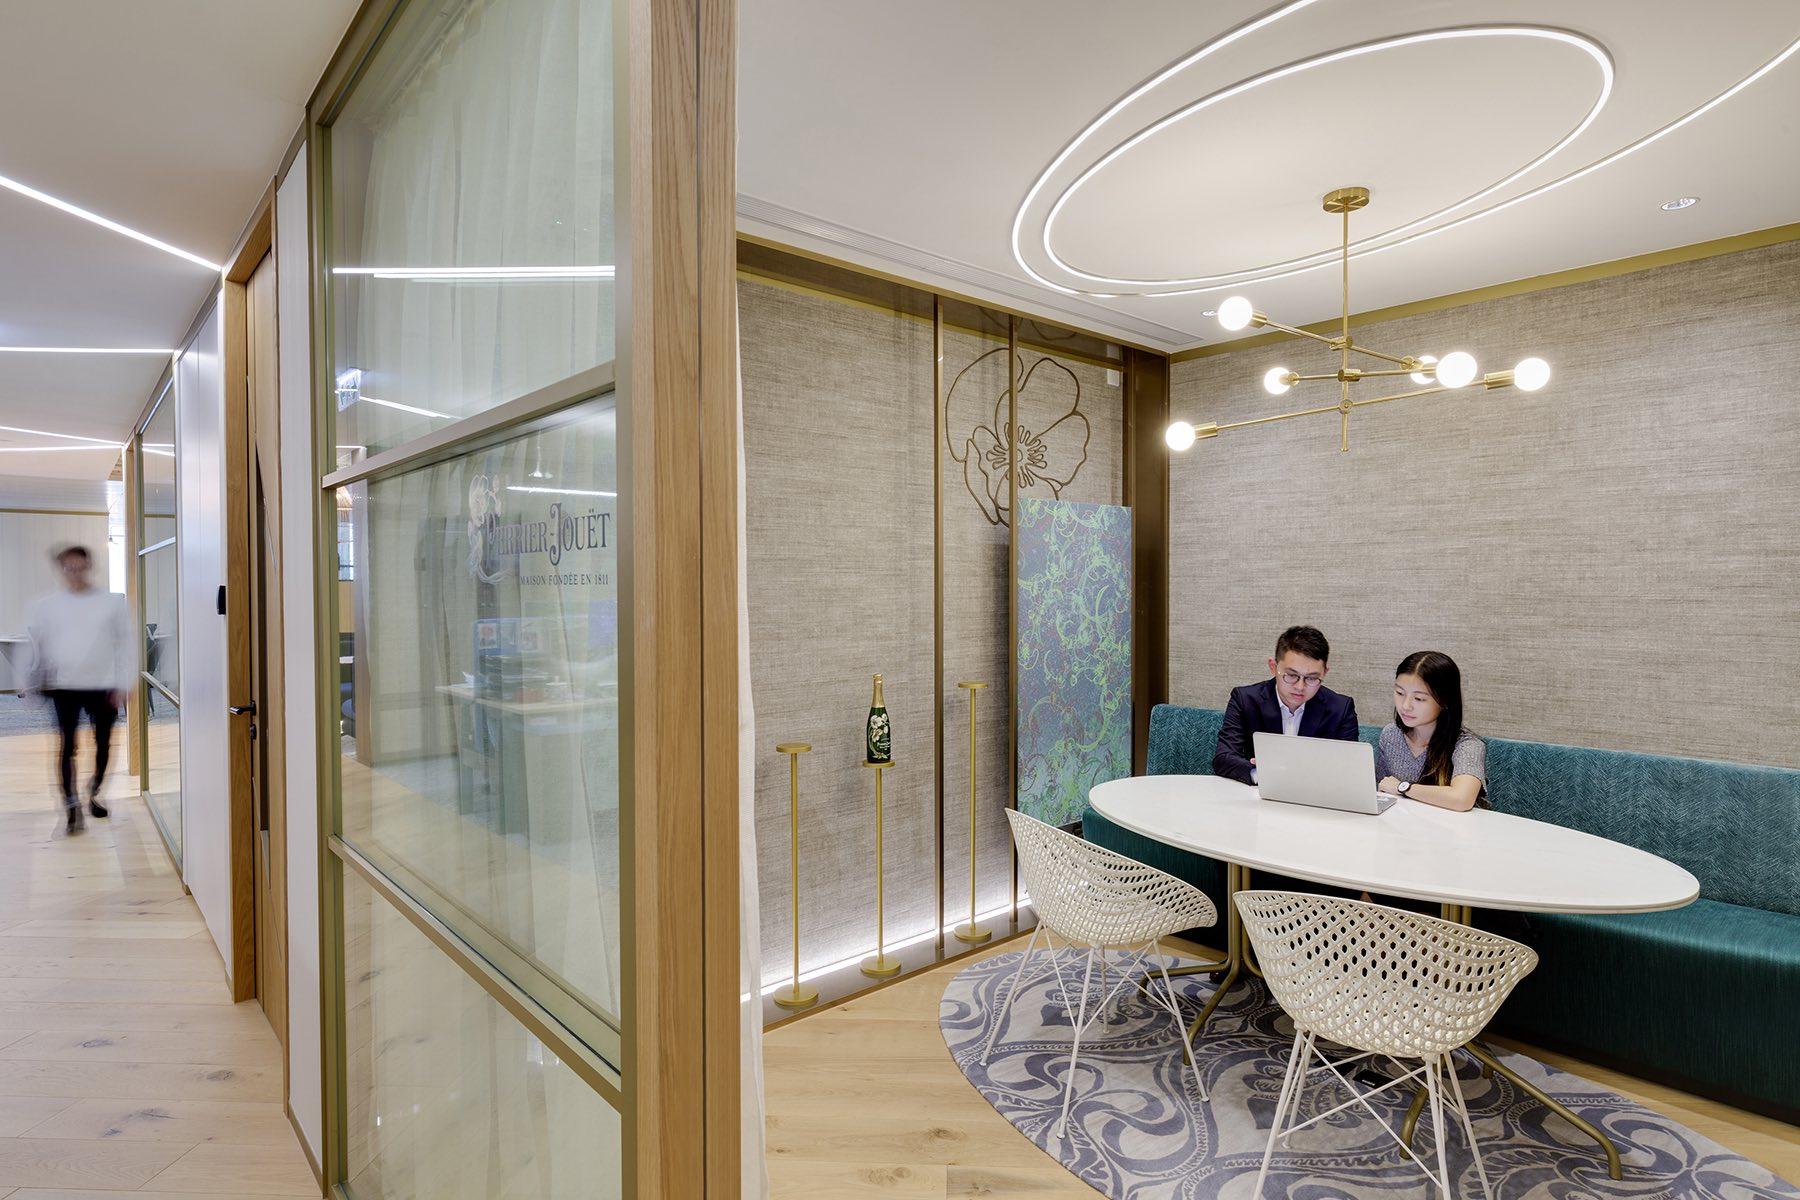 A Look Inside Pernod Ricard's New Hong Kong Office